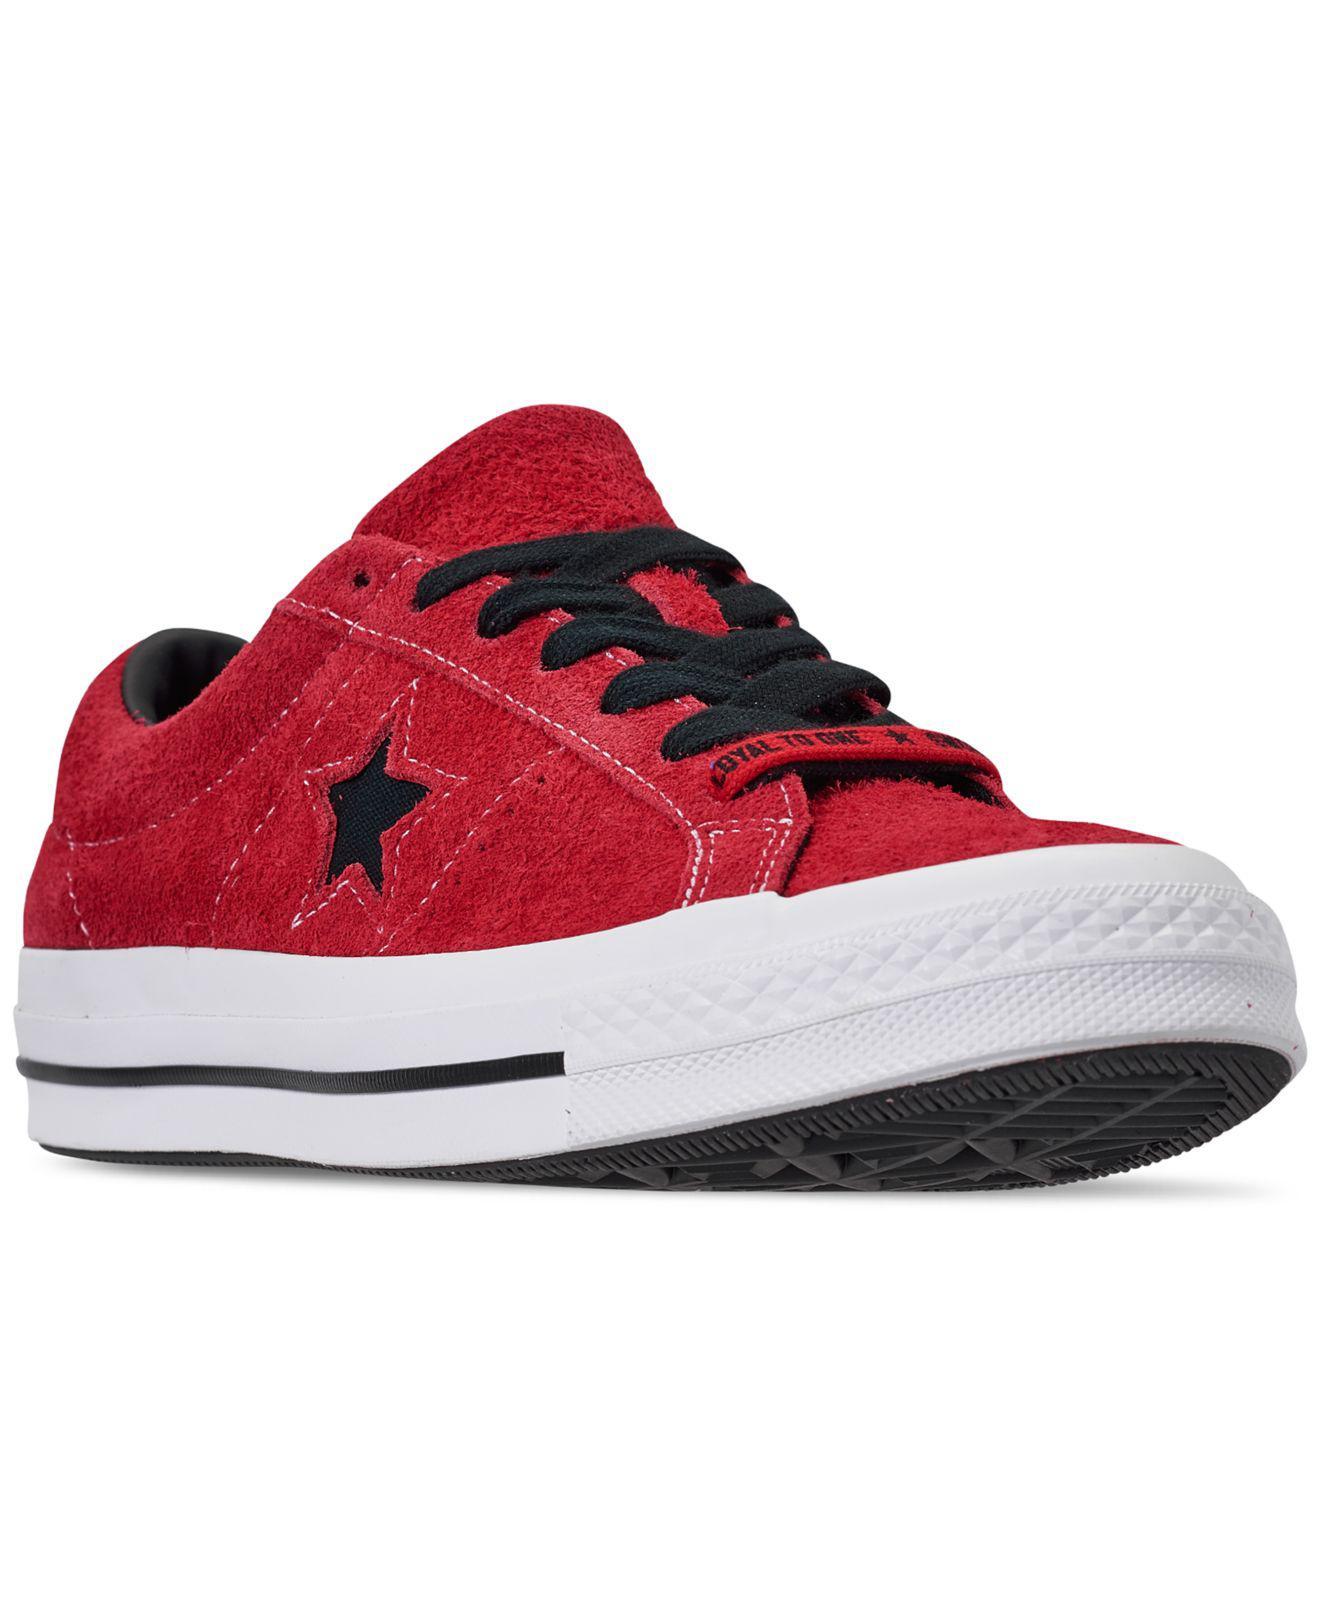 Red For Converse Star Ox One White In Men Enamel Black Lyst tQhorsxBdC